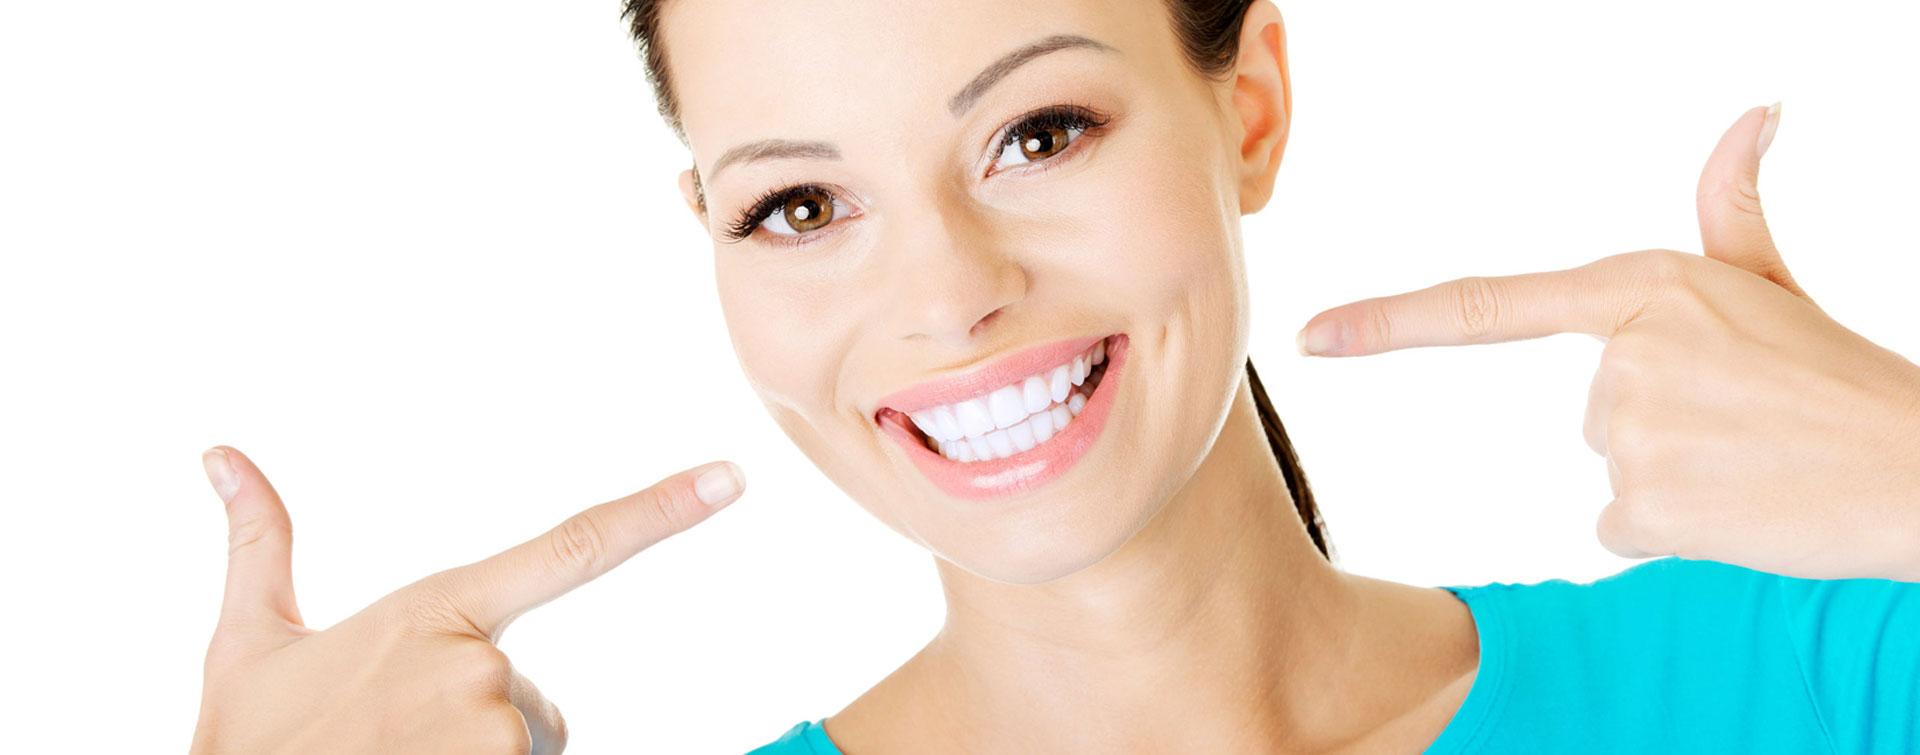 Pearse Road Dental Practice Sligo Town Ireland family dentist